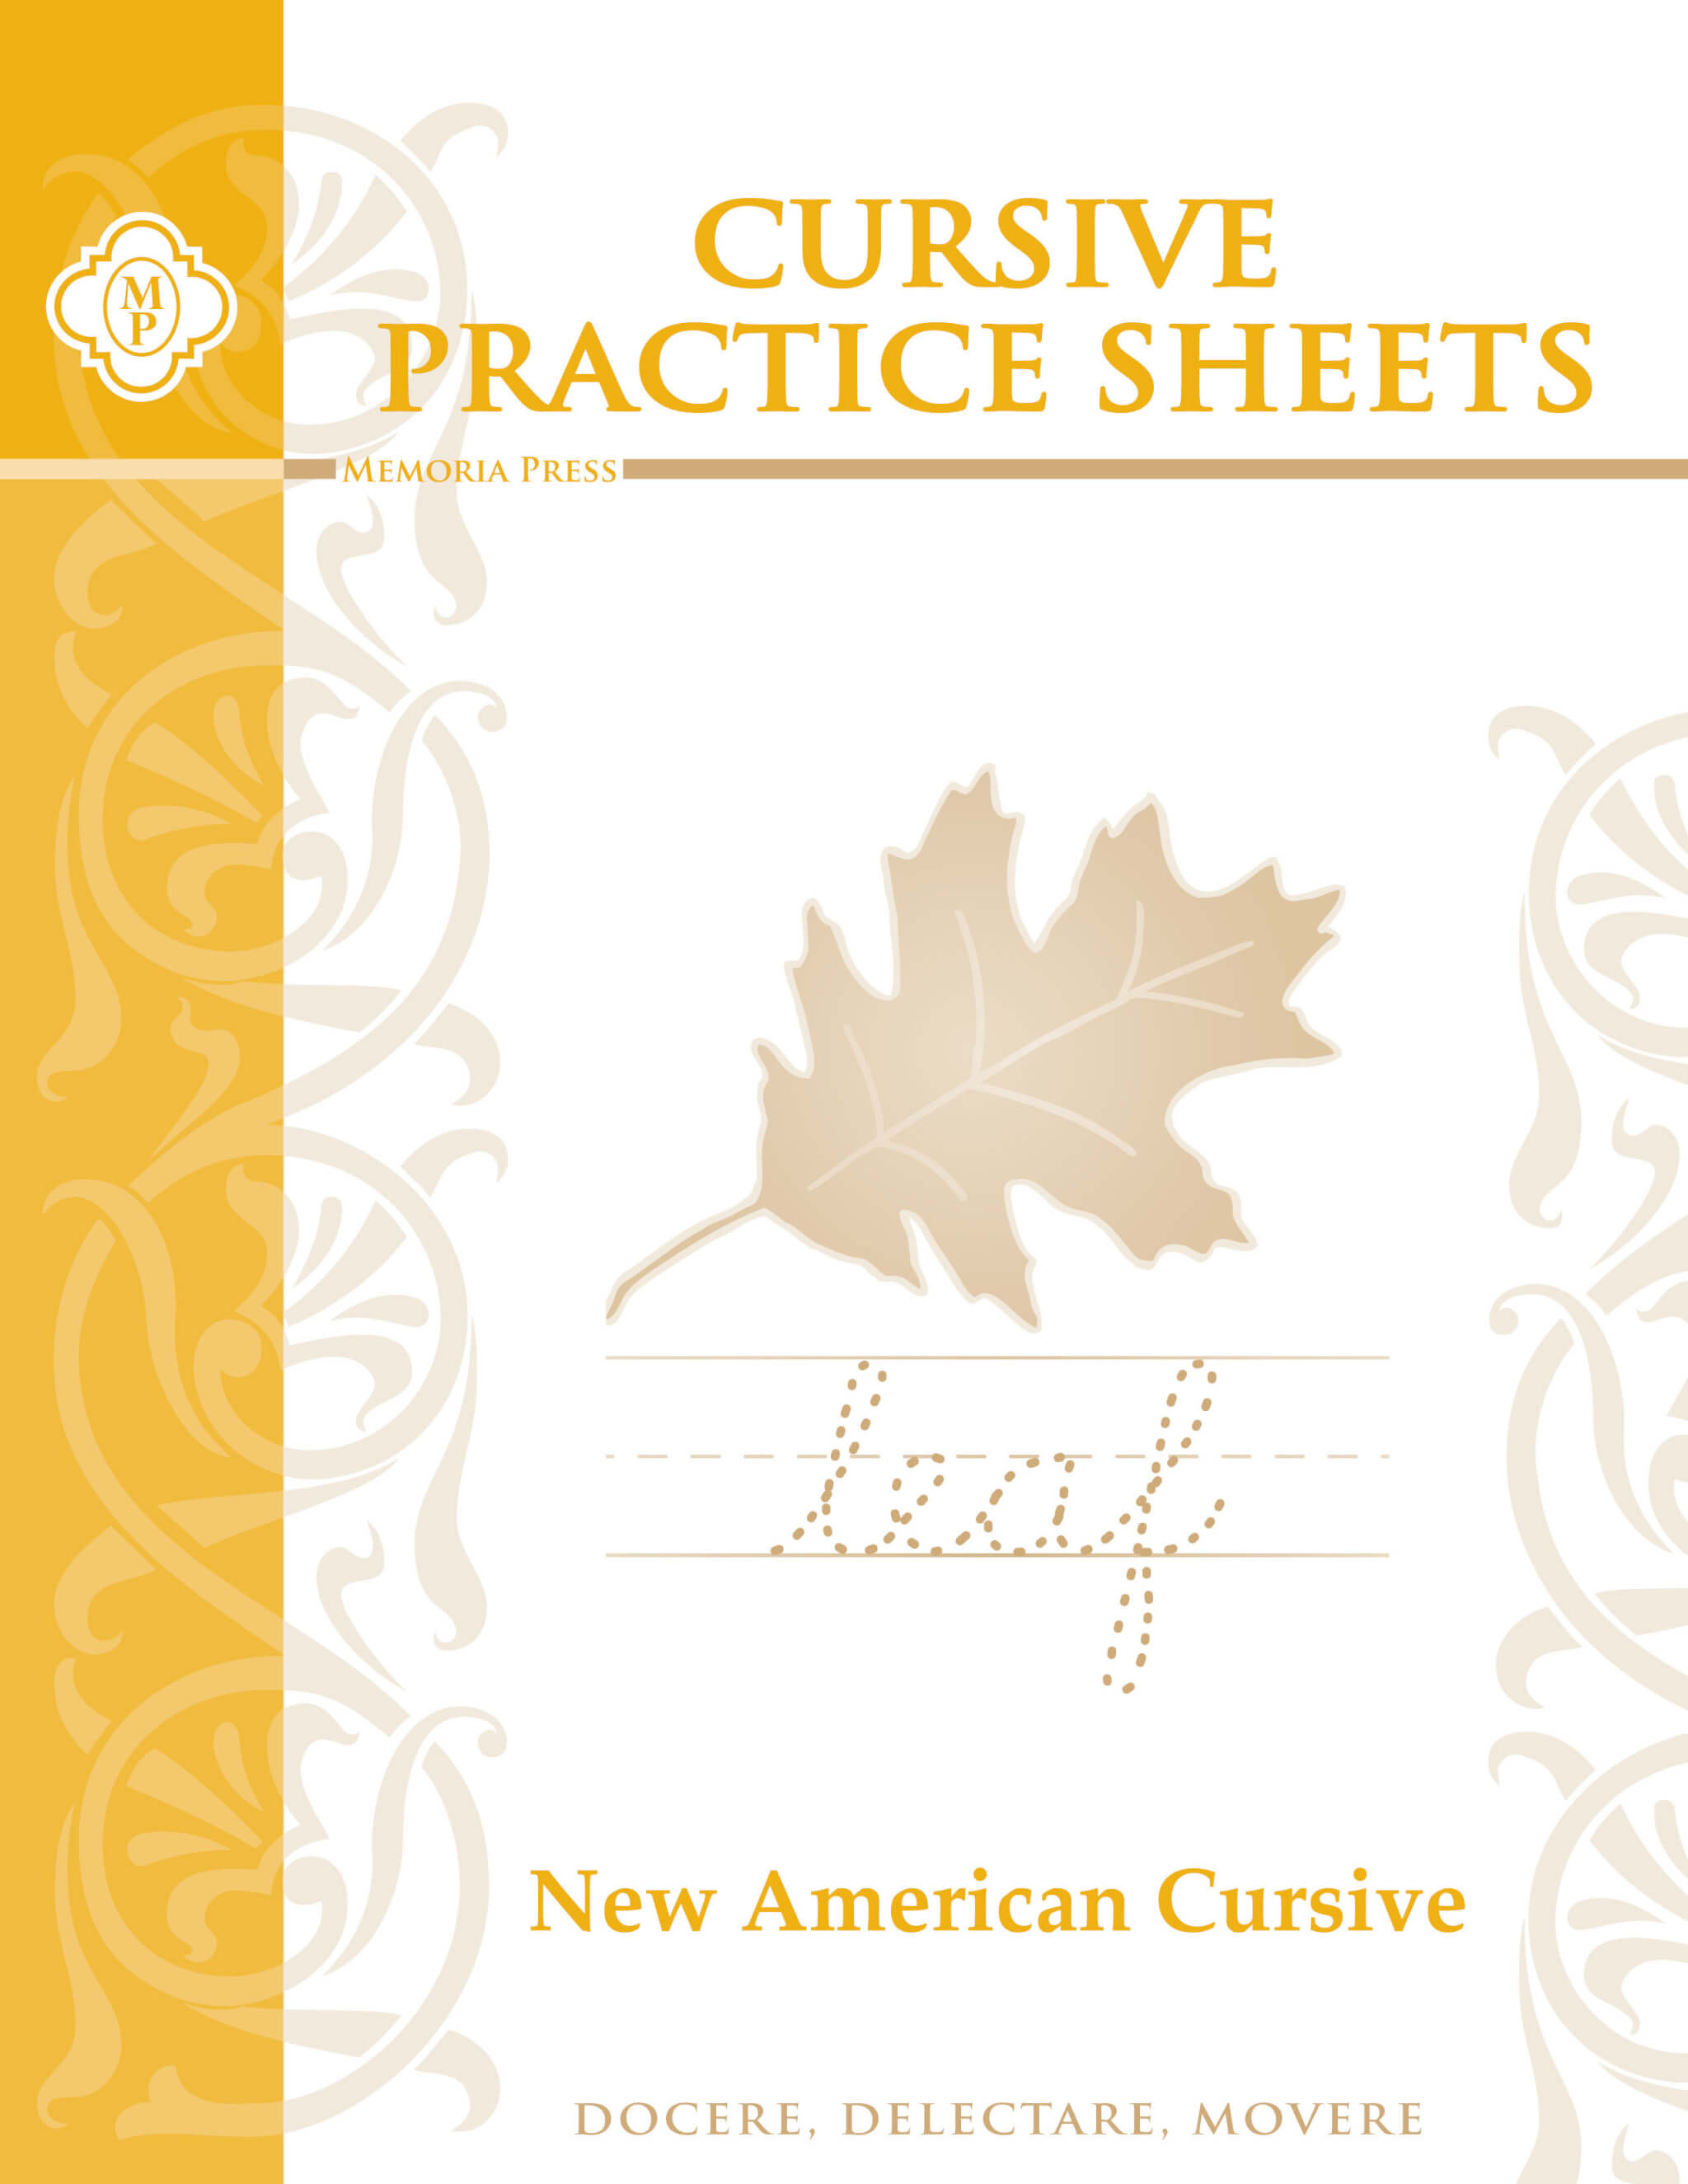 Cursive Practice Sheets Memoria Press